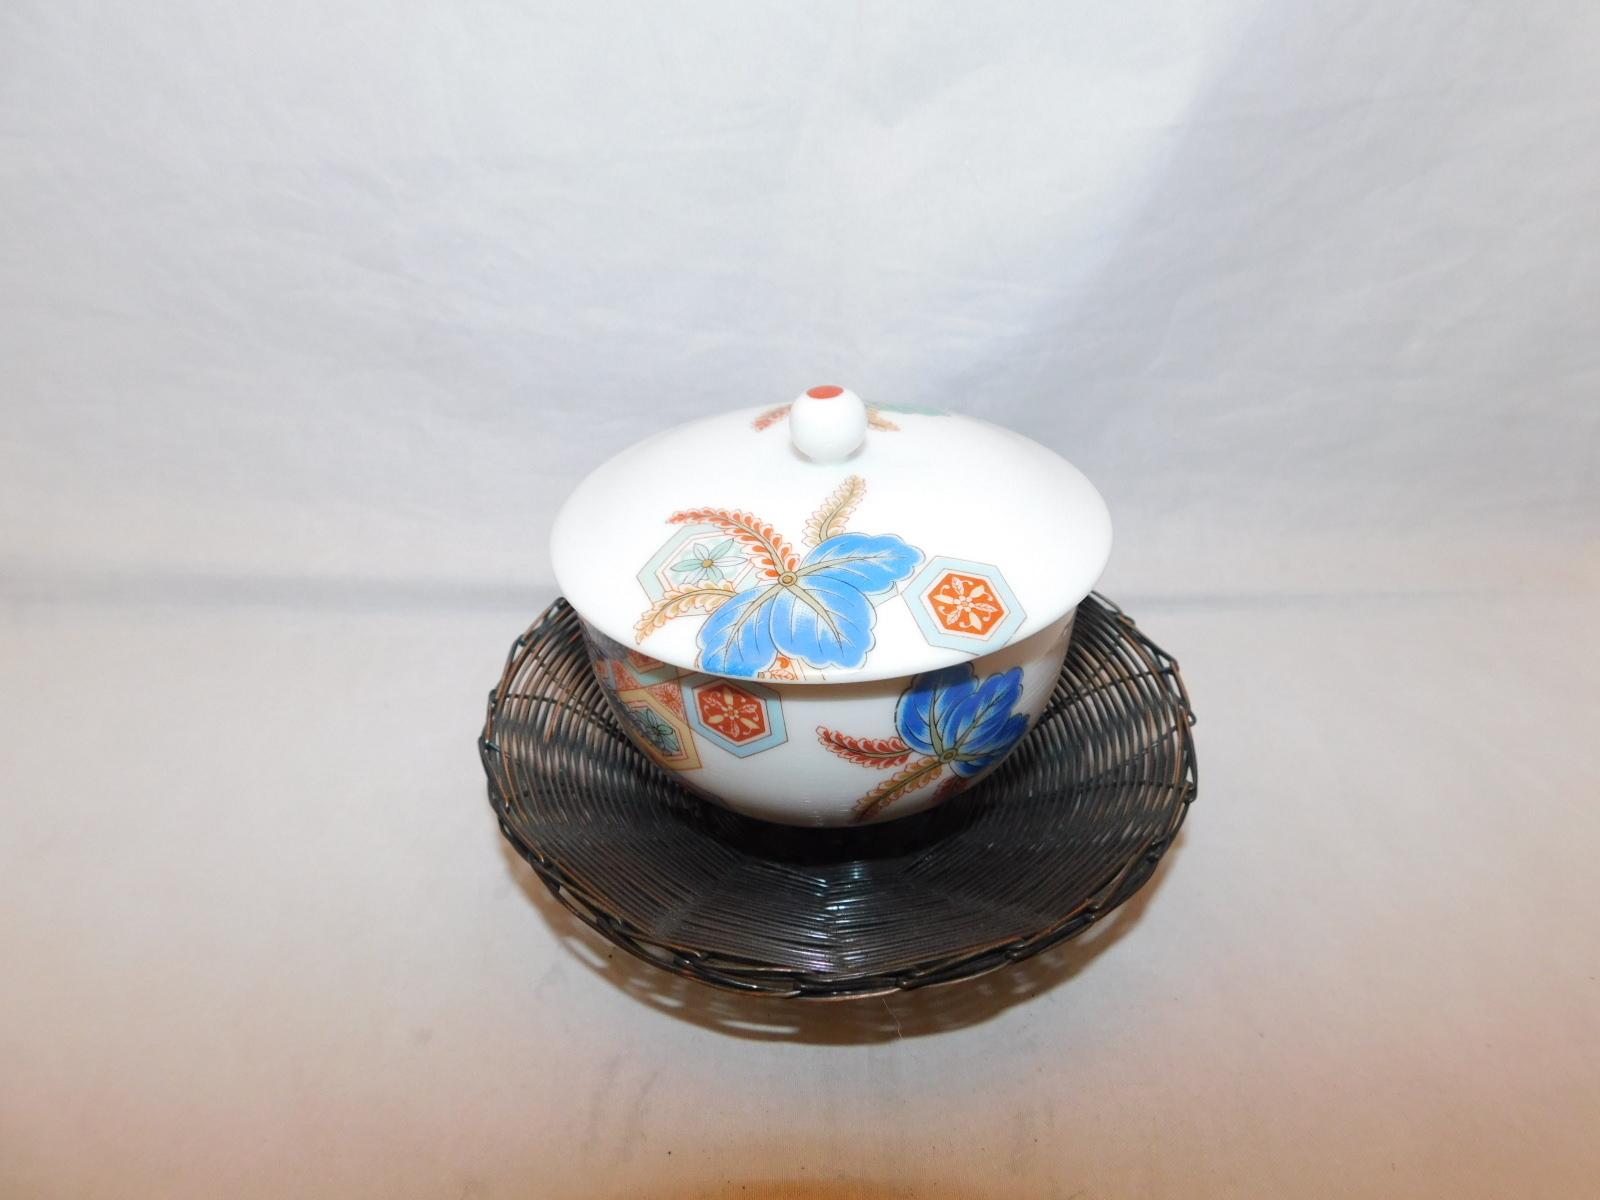 編目茶托(5客)metal Japanese tea five saucers (No18)